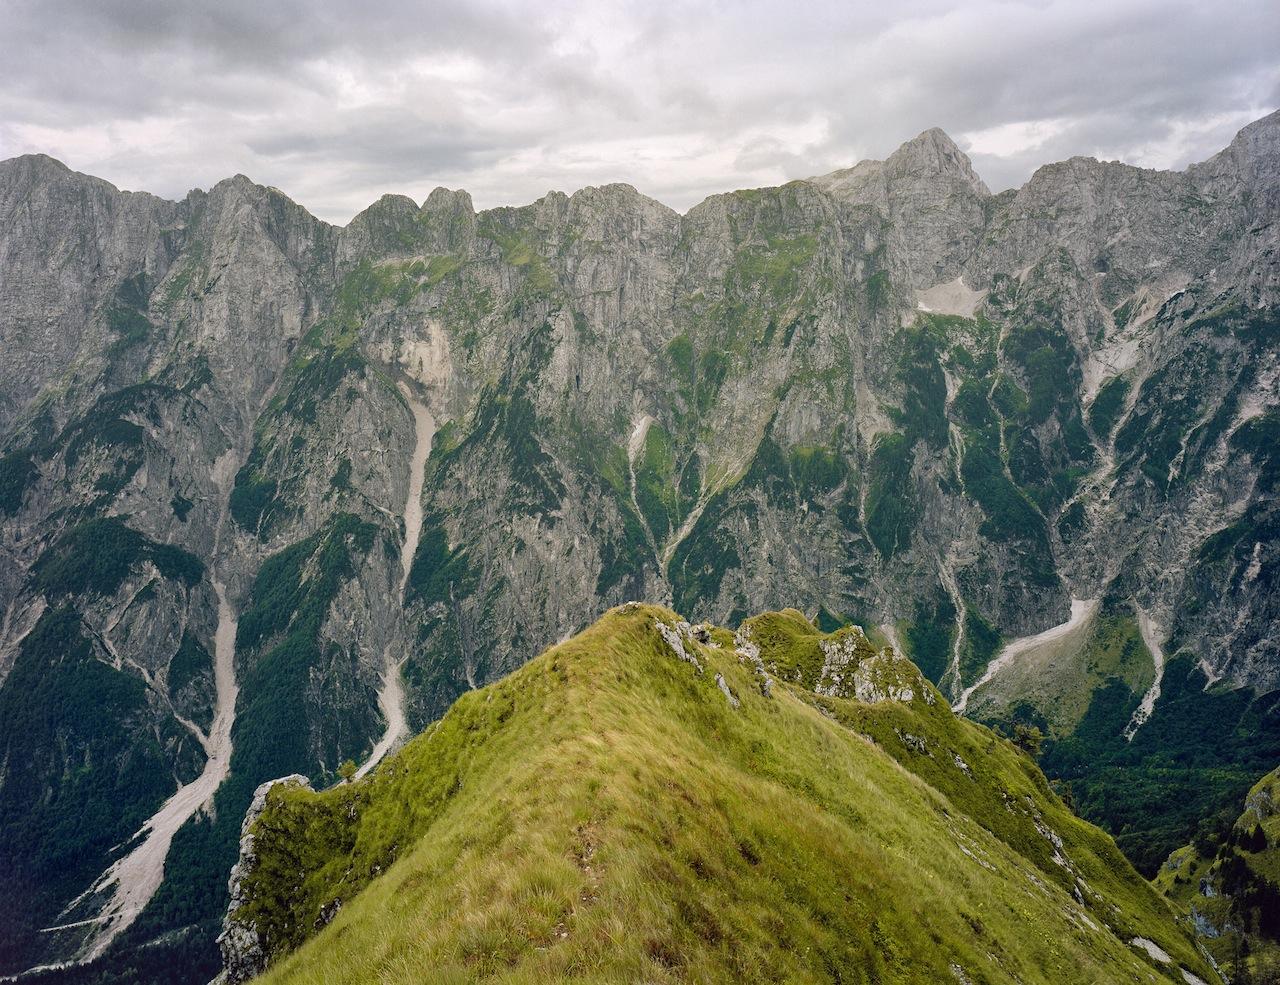 Mangart Area, Slovenia, 2013 (© Olaf Unverzart)